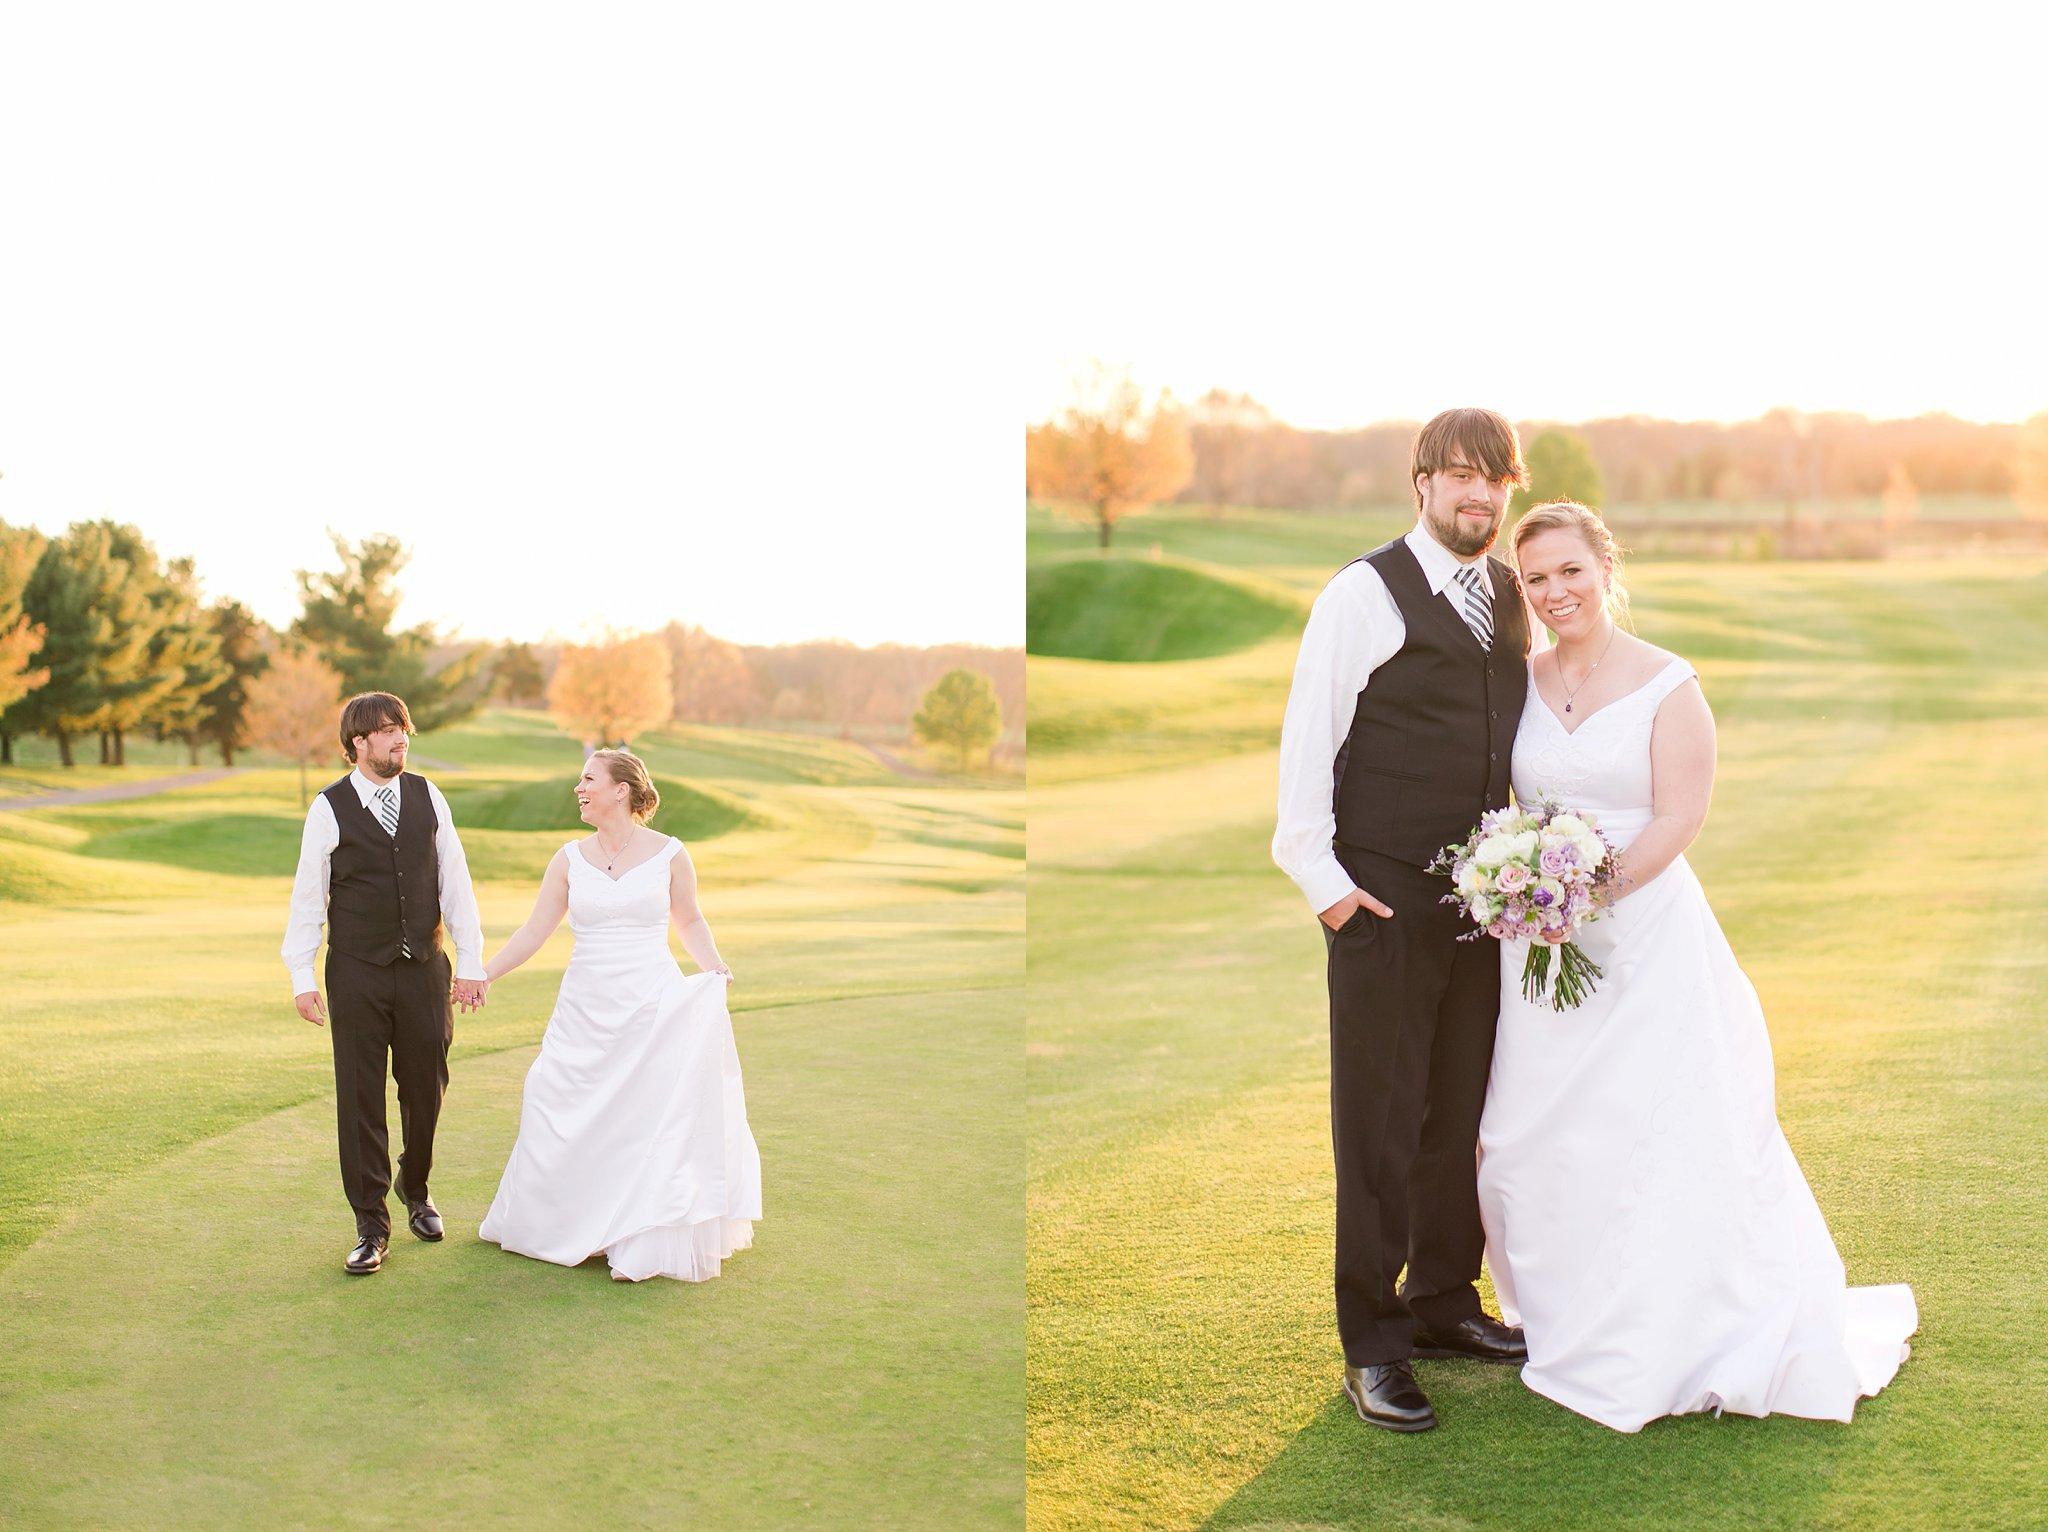 Chantilly National Golf Club Wedding Photos Virginia Wedding Photographer Megan Kelsey Photography Mary Beth and Nathan-110.jpg